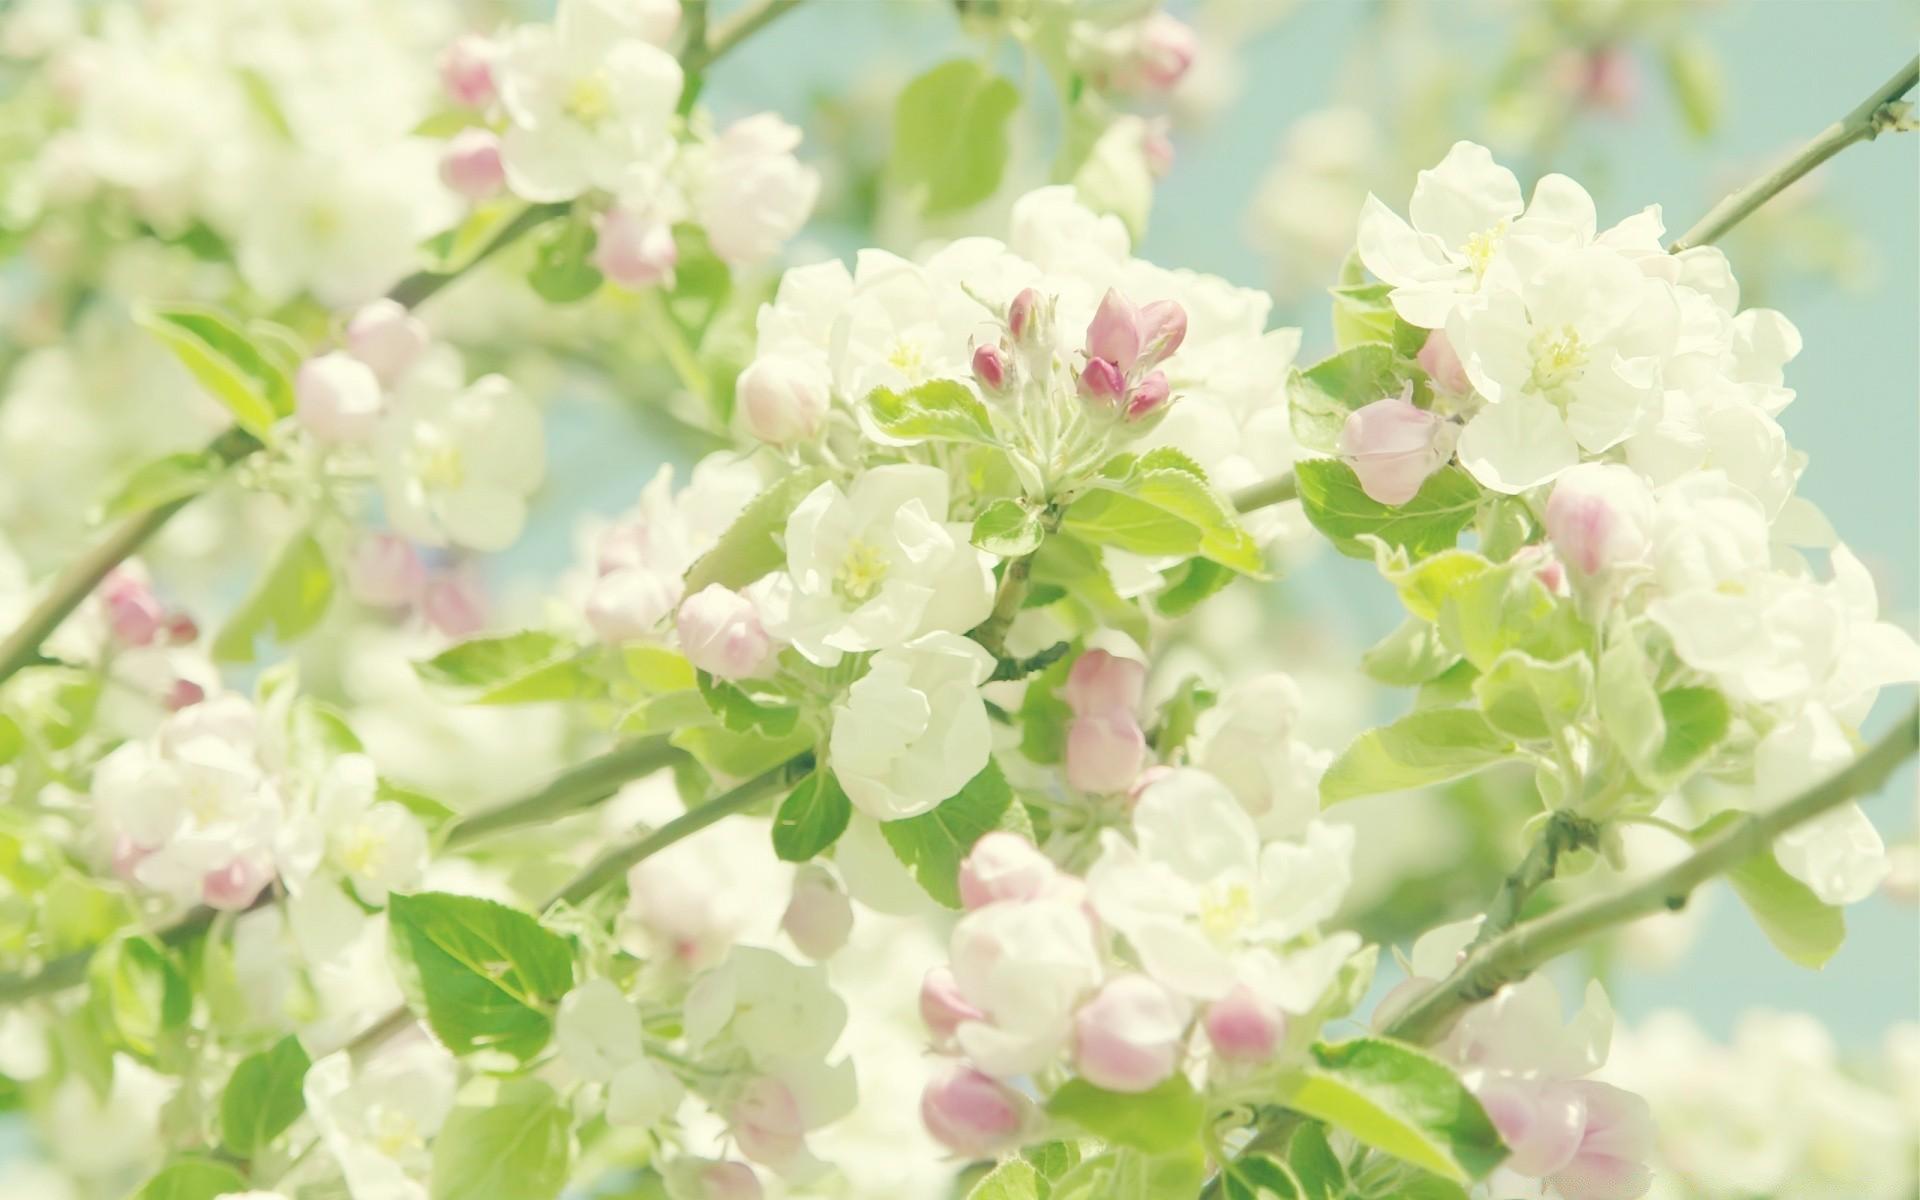 Картинки с весенними цветами